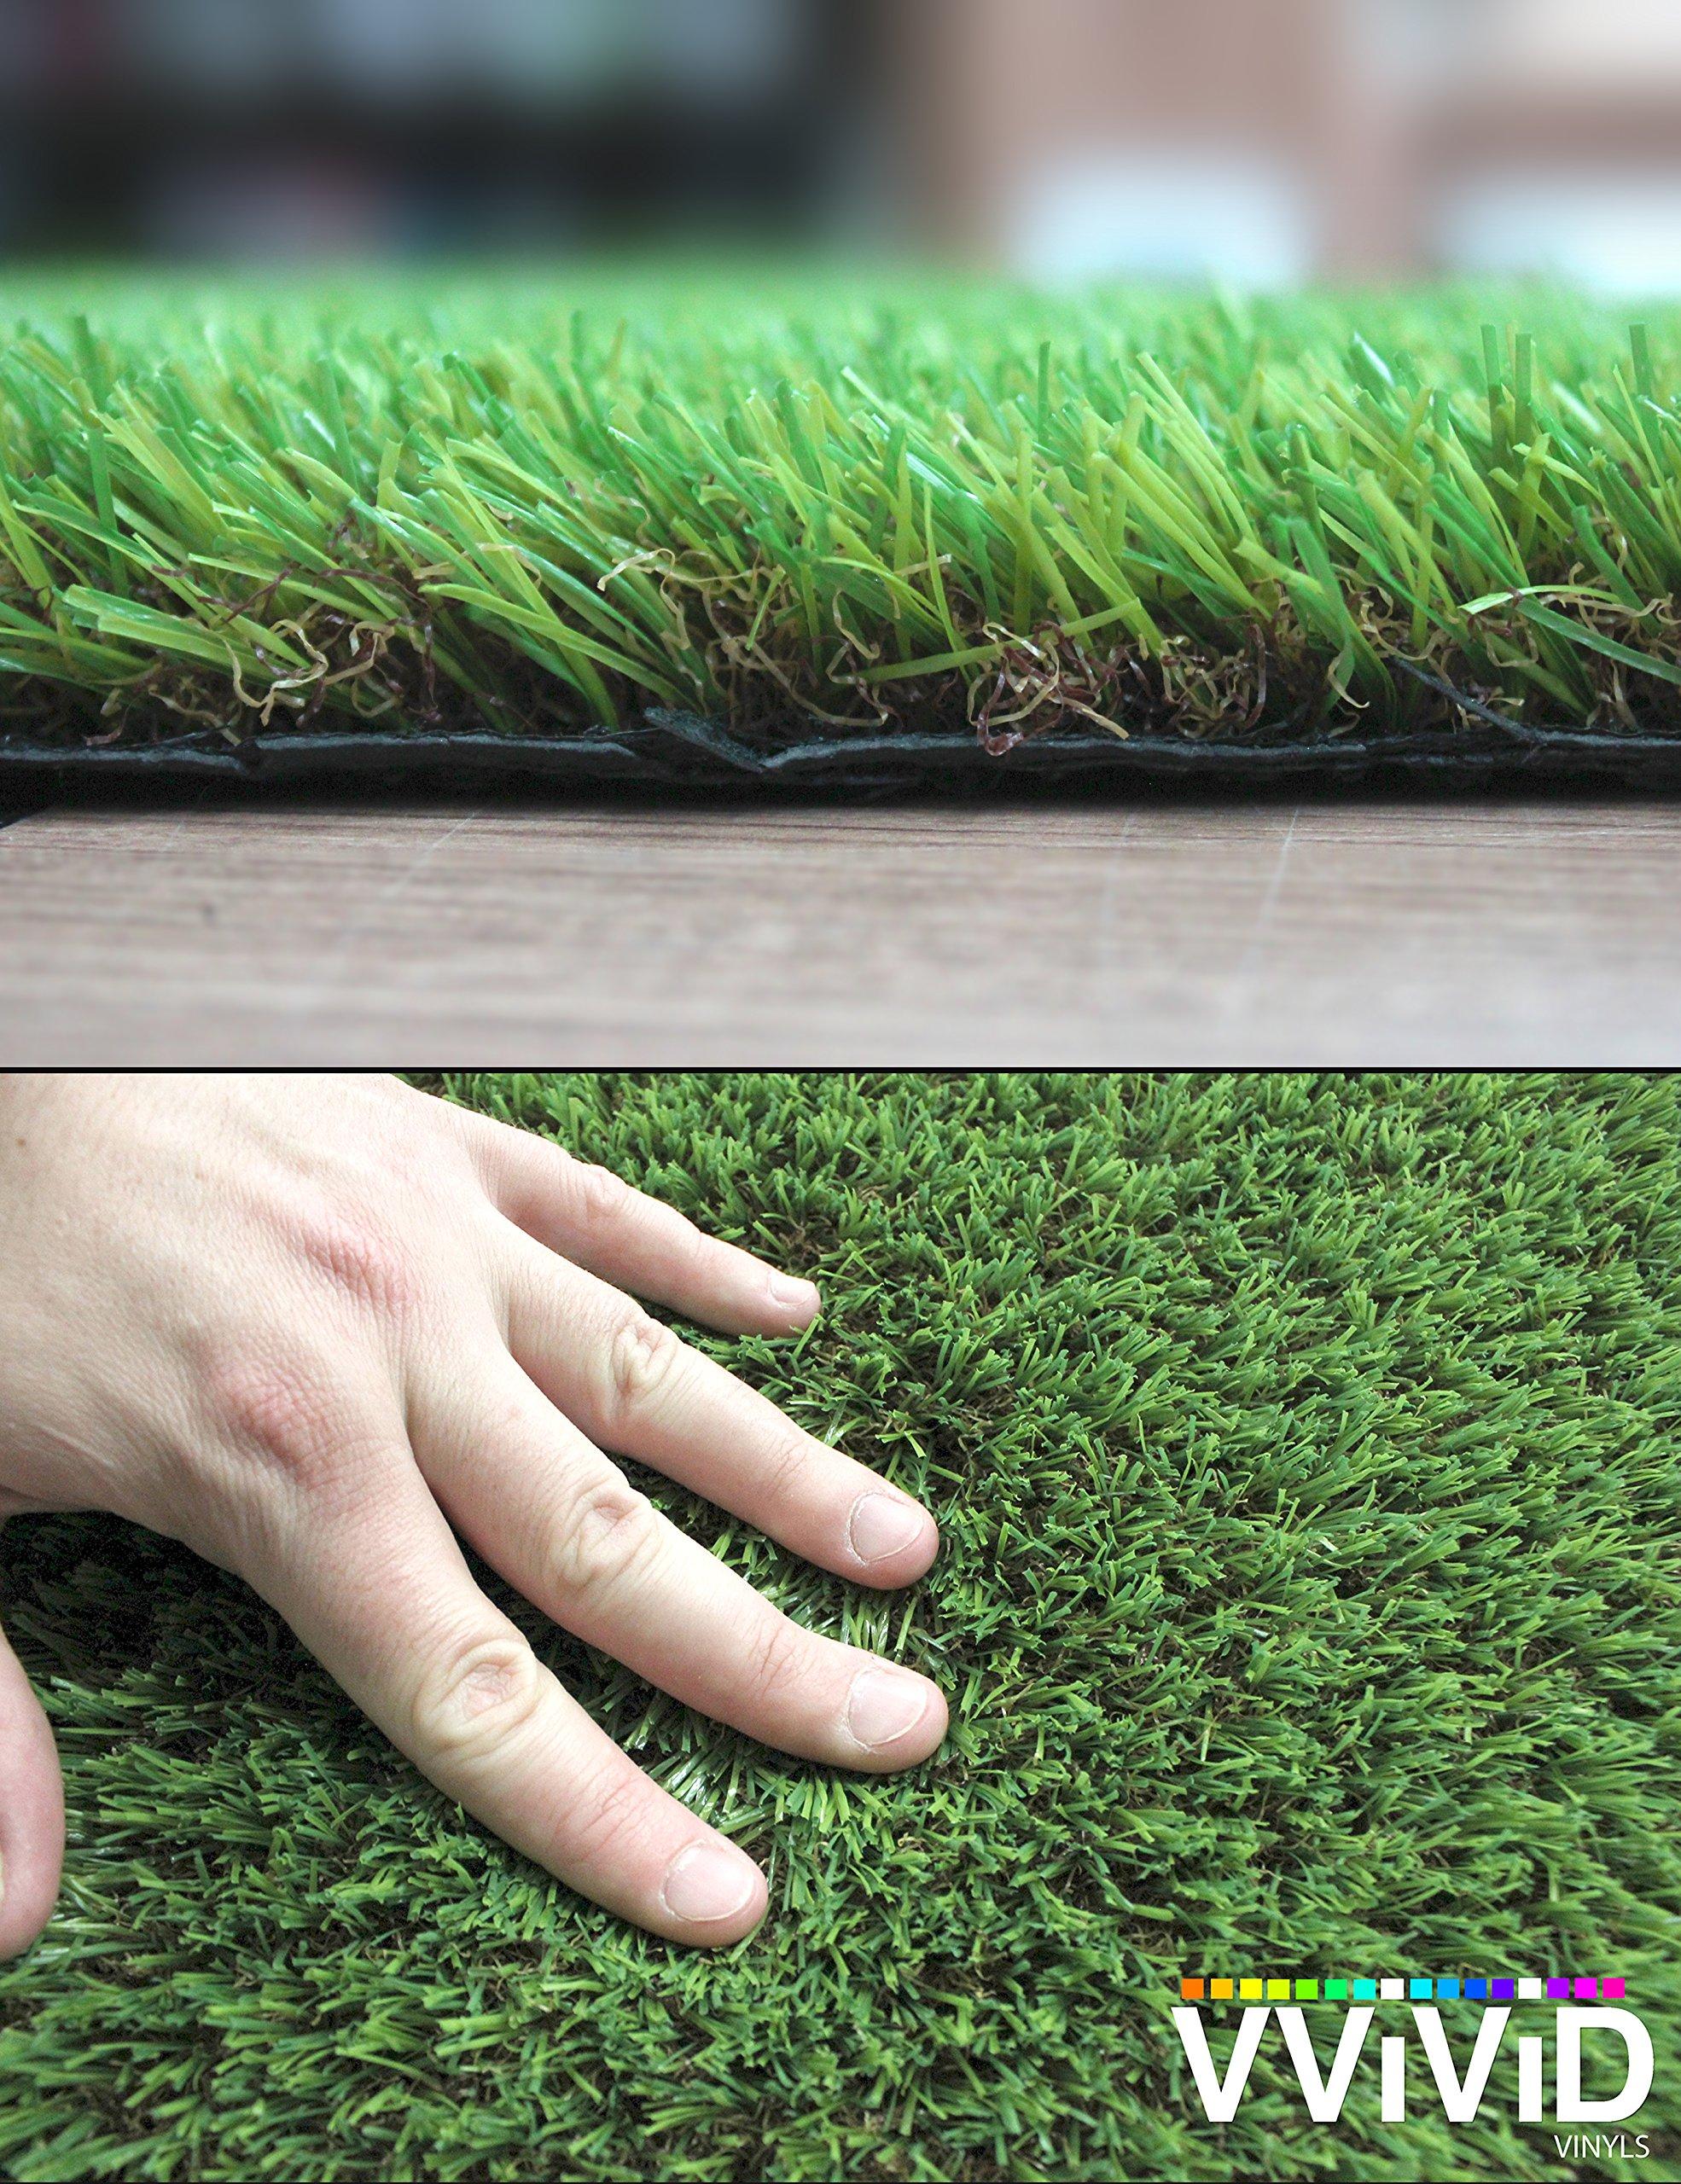 VViViD Natural Looking 3-Tone Synthetic Grass Anti-UV Vinyl Turf Mat Bulk Roll (12ft x 40'' Roll) by VViViD